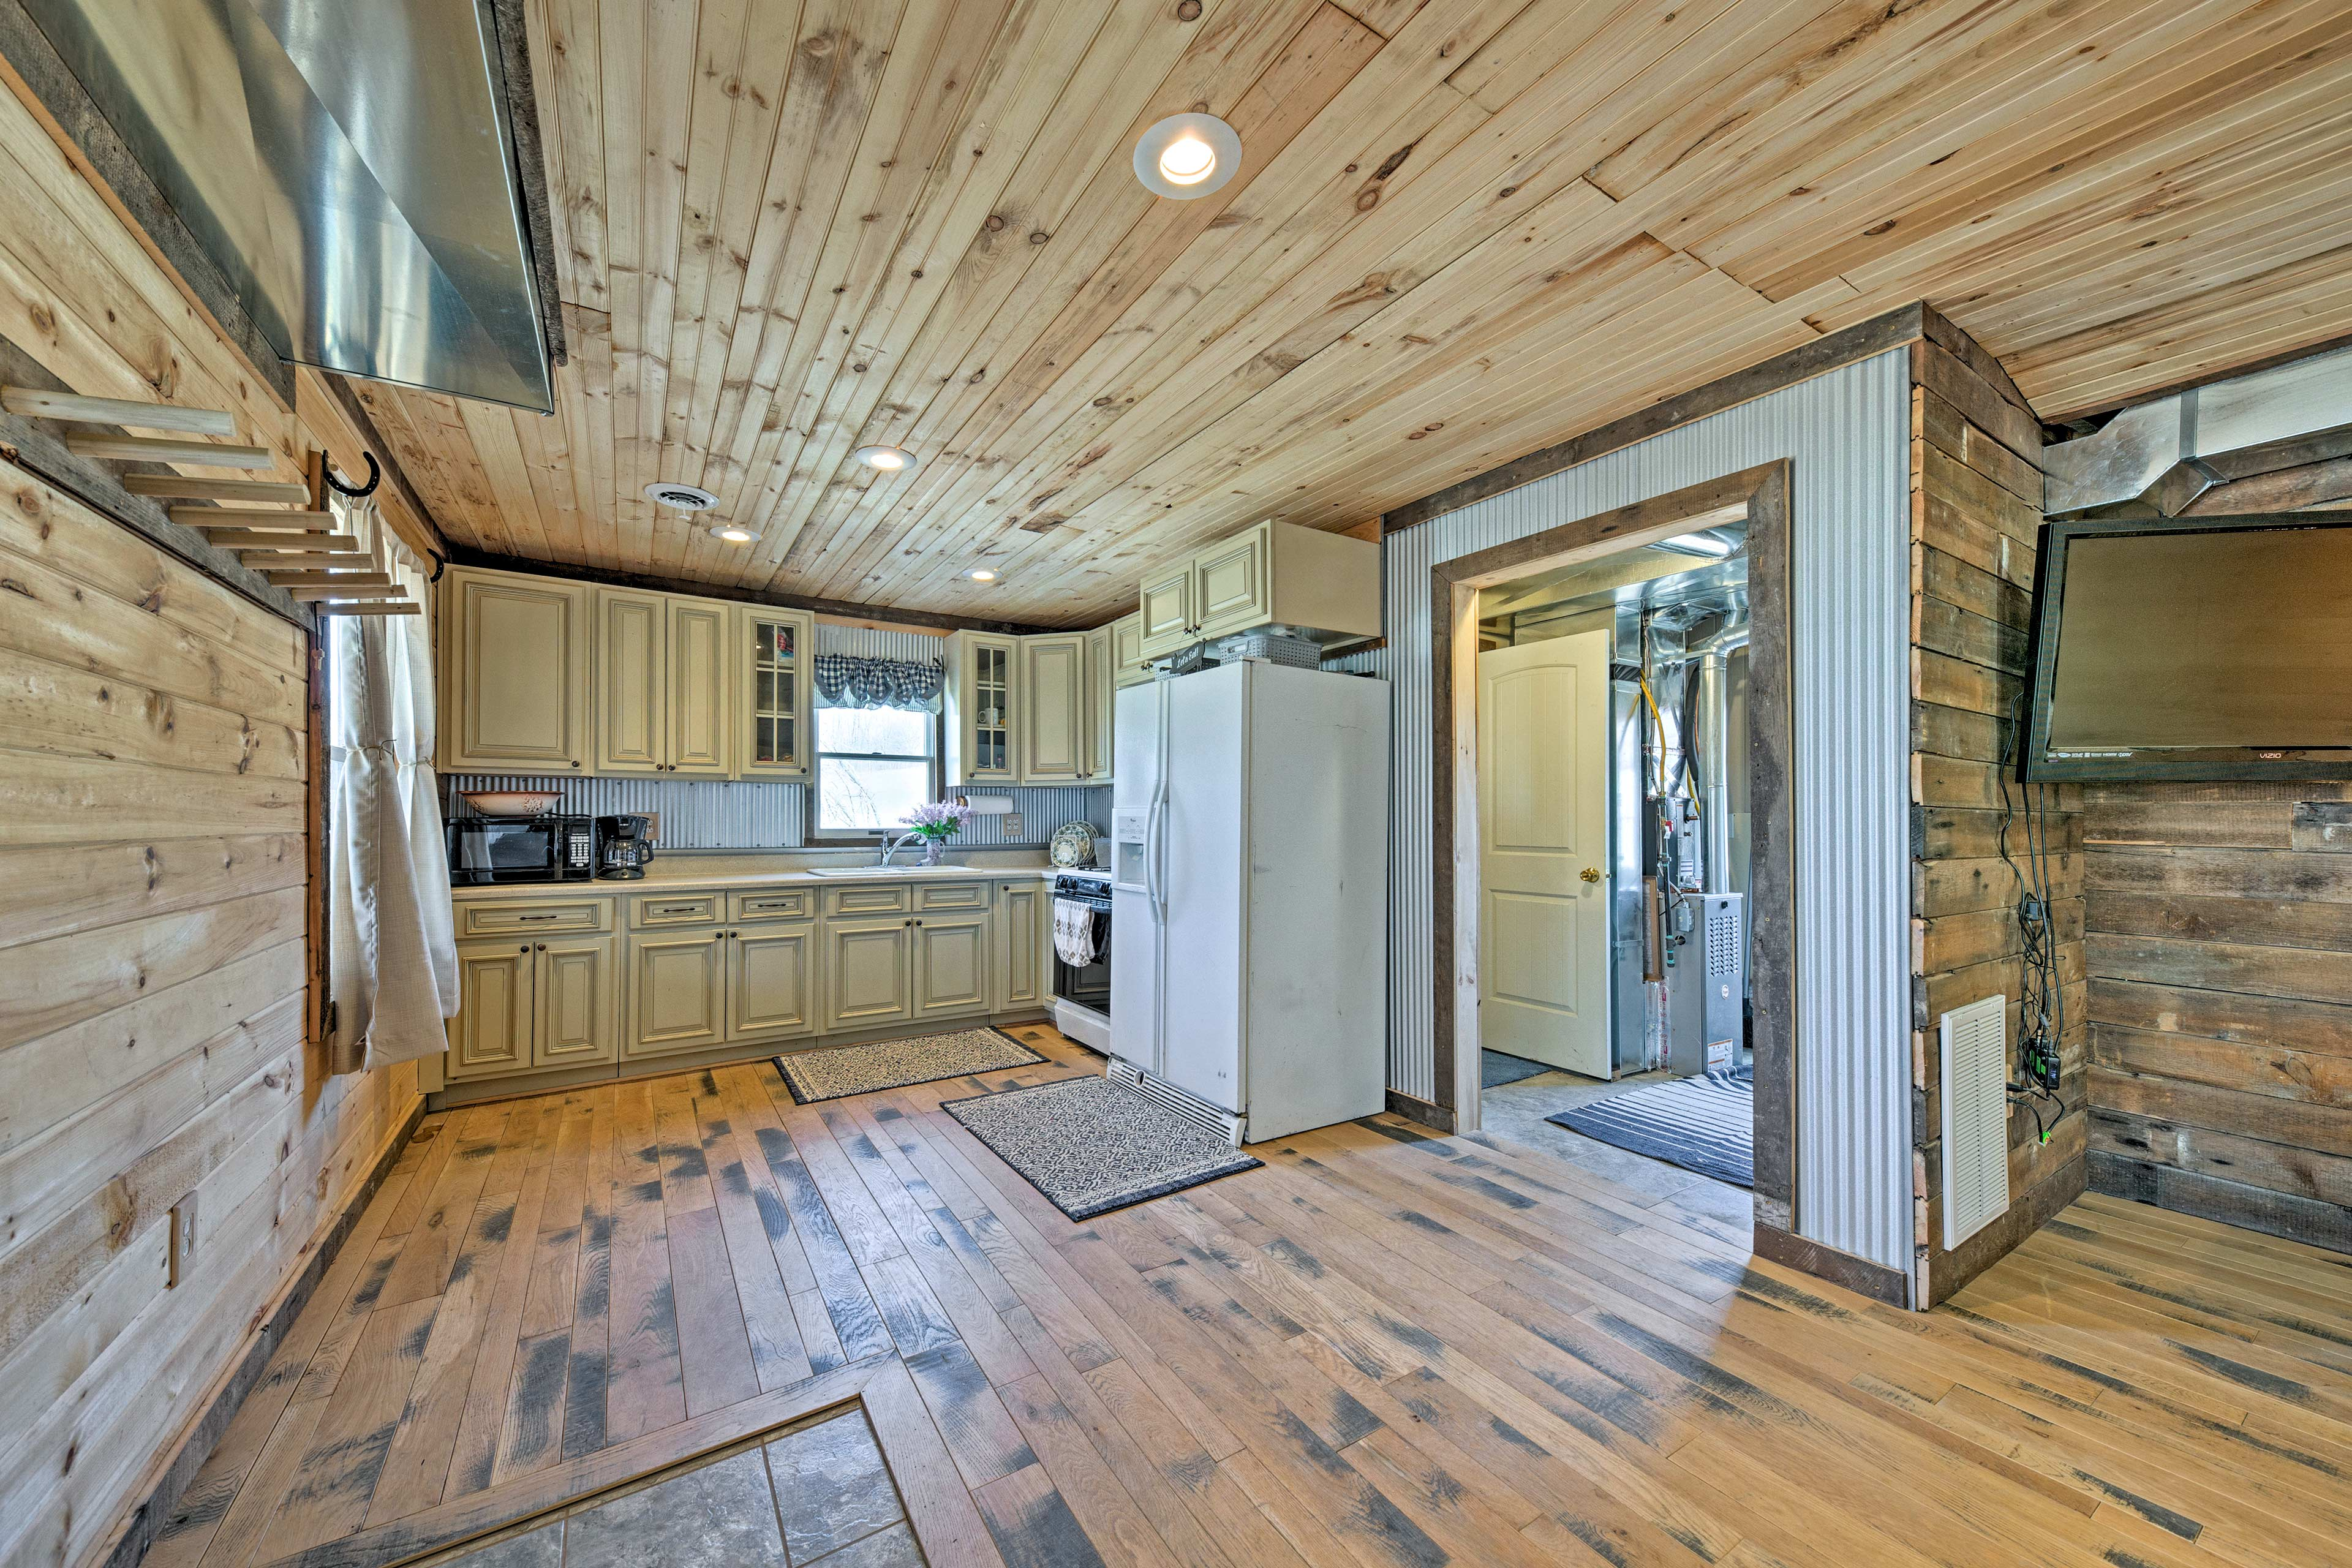 Wood paneled ceilings, walls, and floors exude rustic elegance.